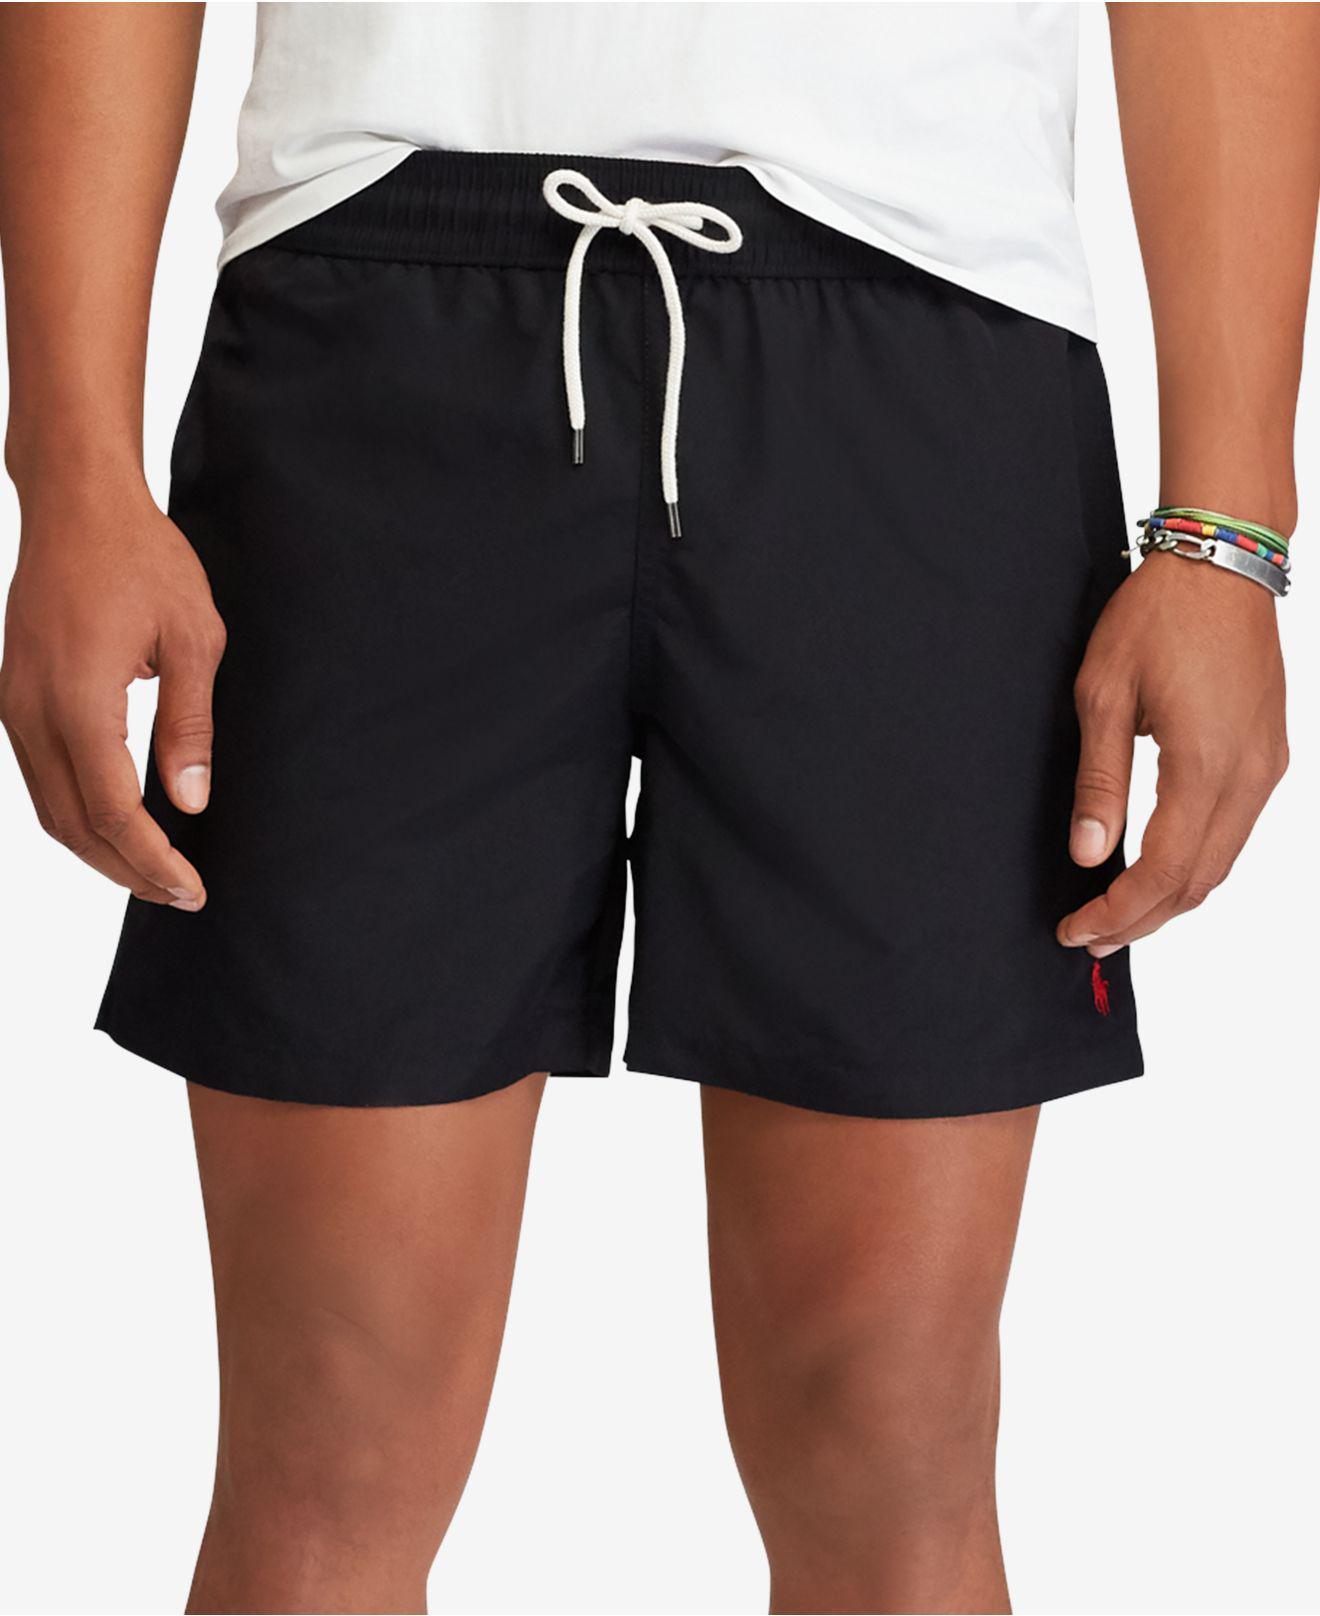 4fada453360f Lyst - Polo Ralph Lauren Hawaiian Swim Boxer in Black for Men - Save 20%